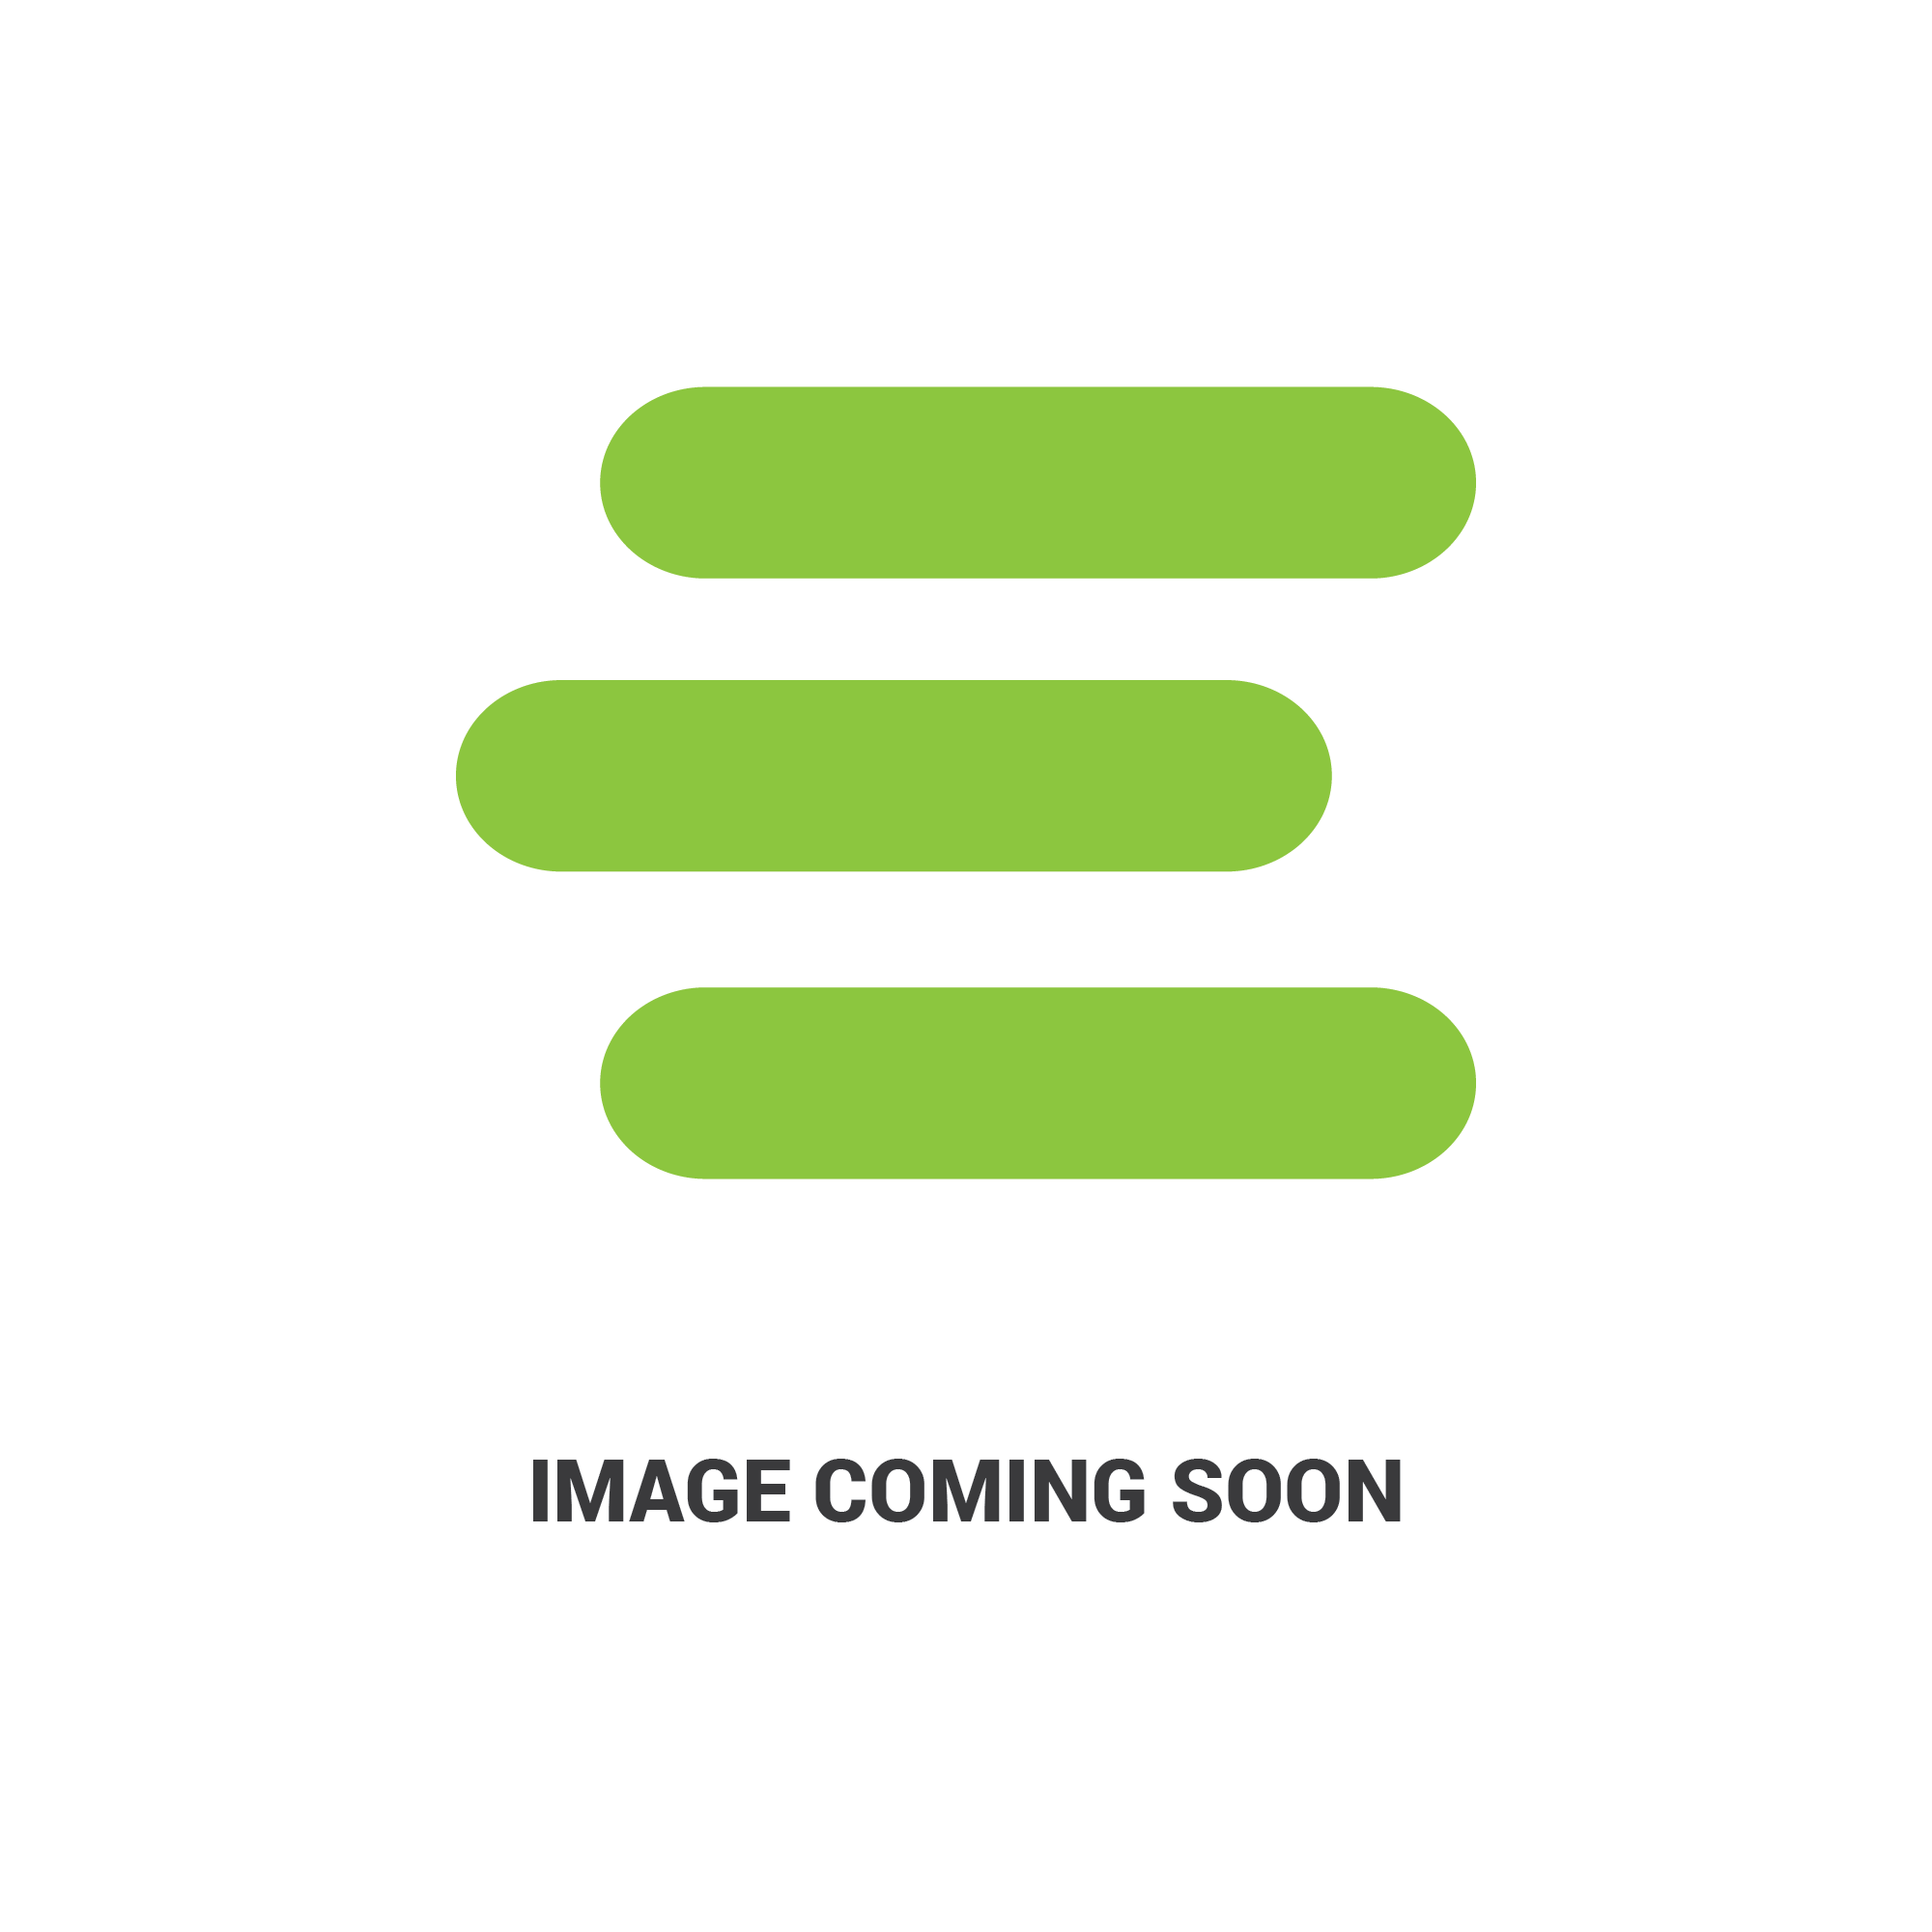 E-AUC14430edit 2185.jpg